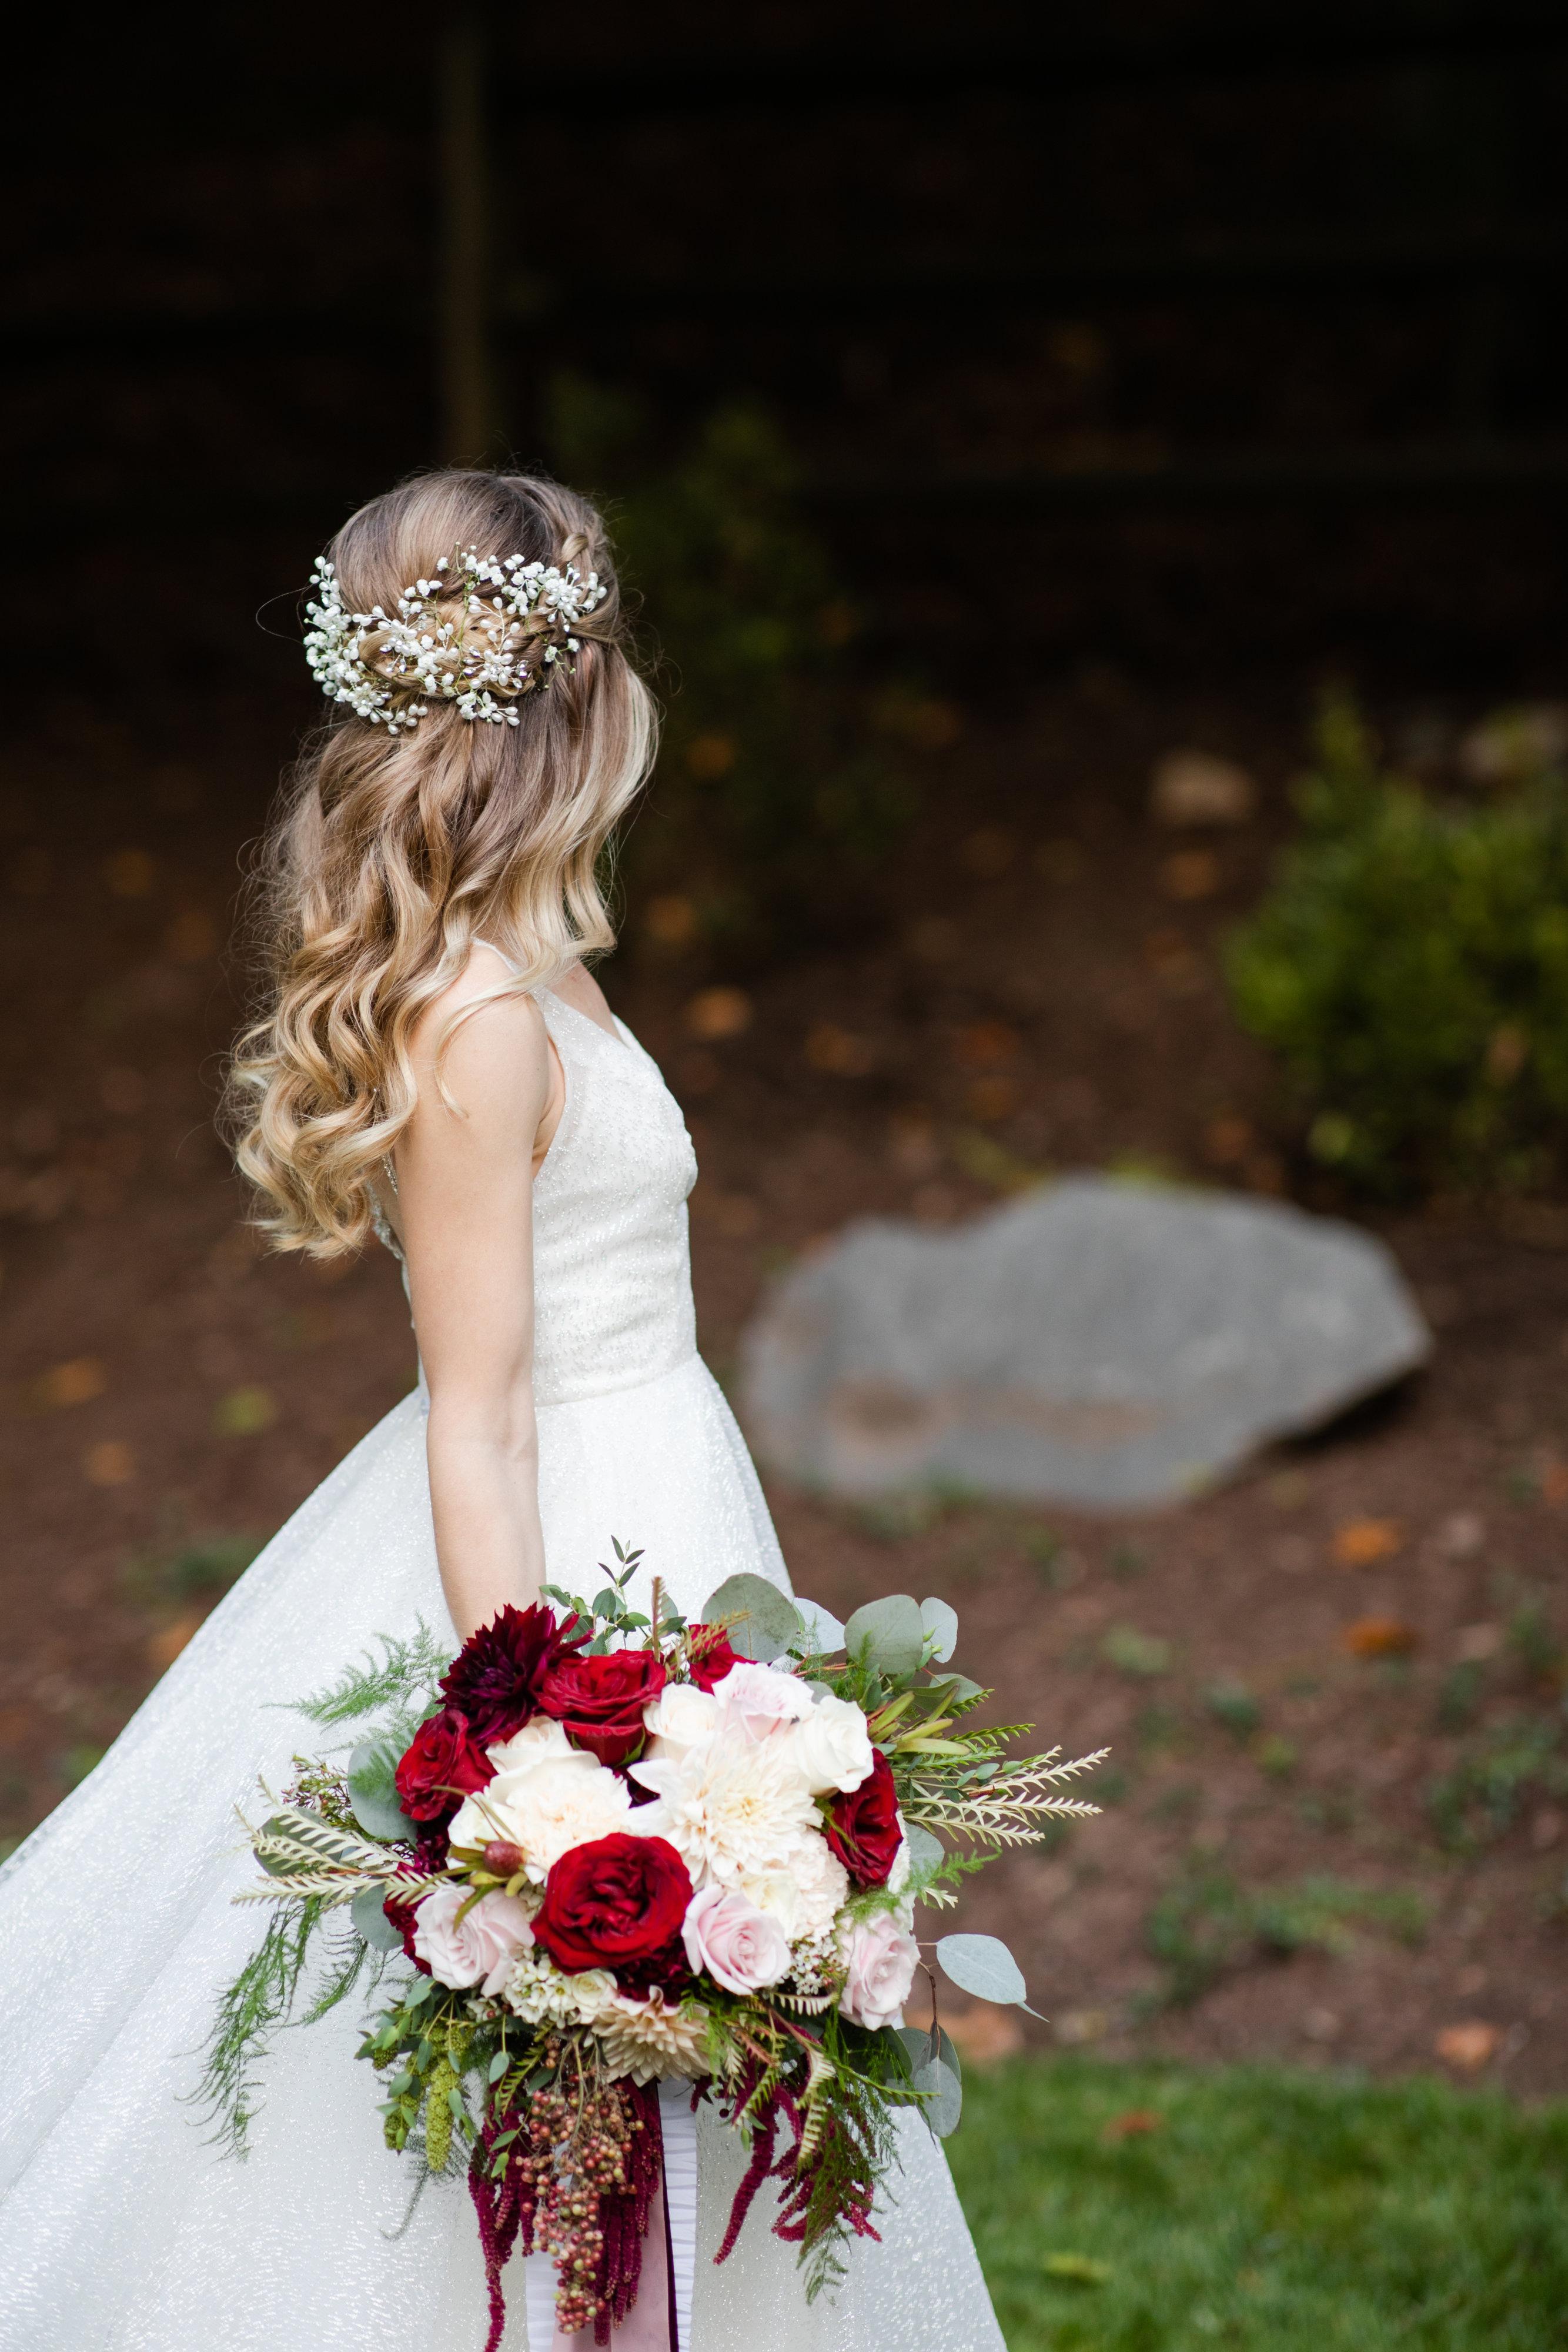 StefanieKamermanPhotography-MelanieandBenjamin-Wedding-Bethesda,MD-2019-10-12-140